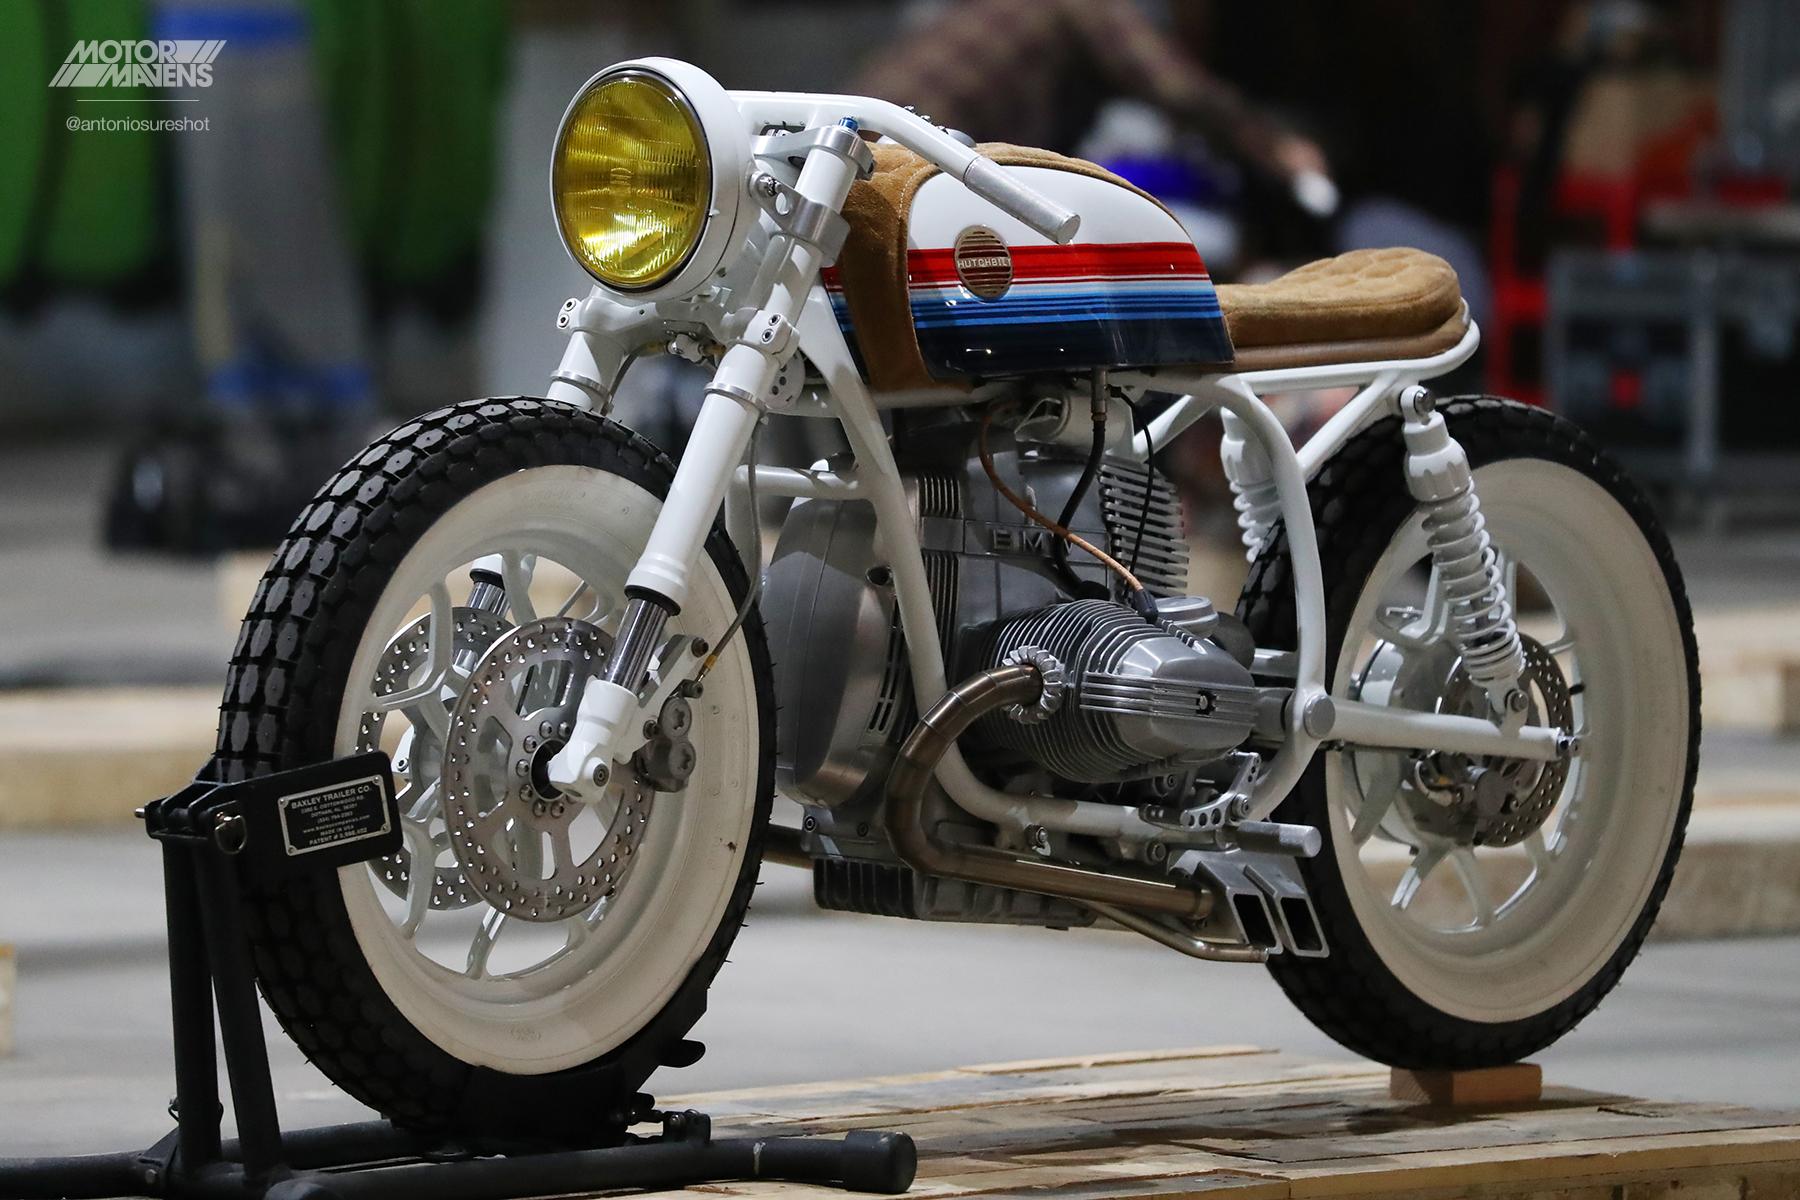 Hutchbilt BMW R80 Skyway Boardracer Cafe Racer Motorcycle Jeremy Hutch OG Moto Show OGmotoshow AA1_0474 1800wm.jpg